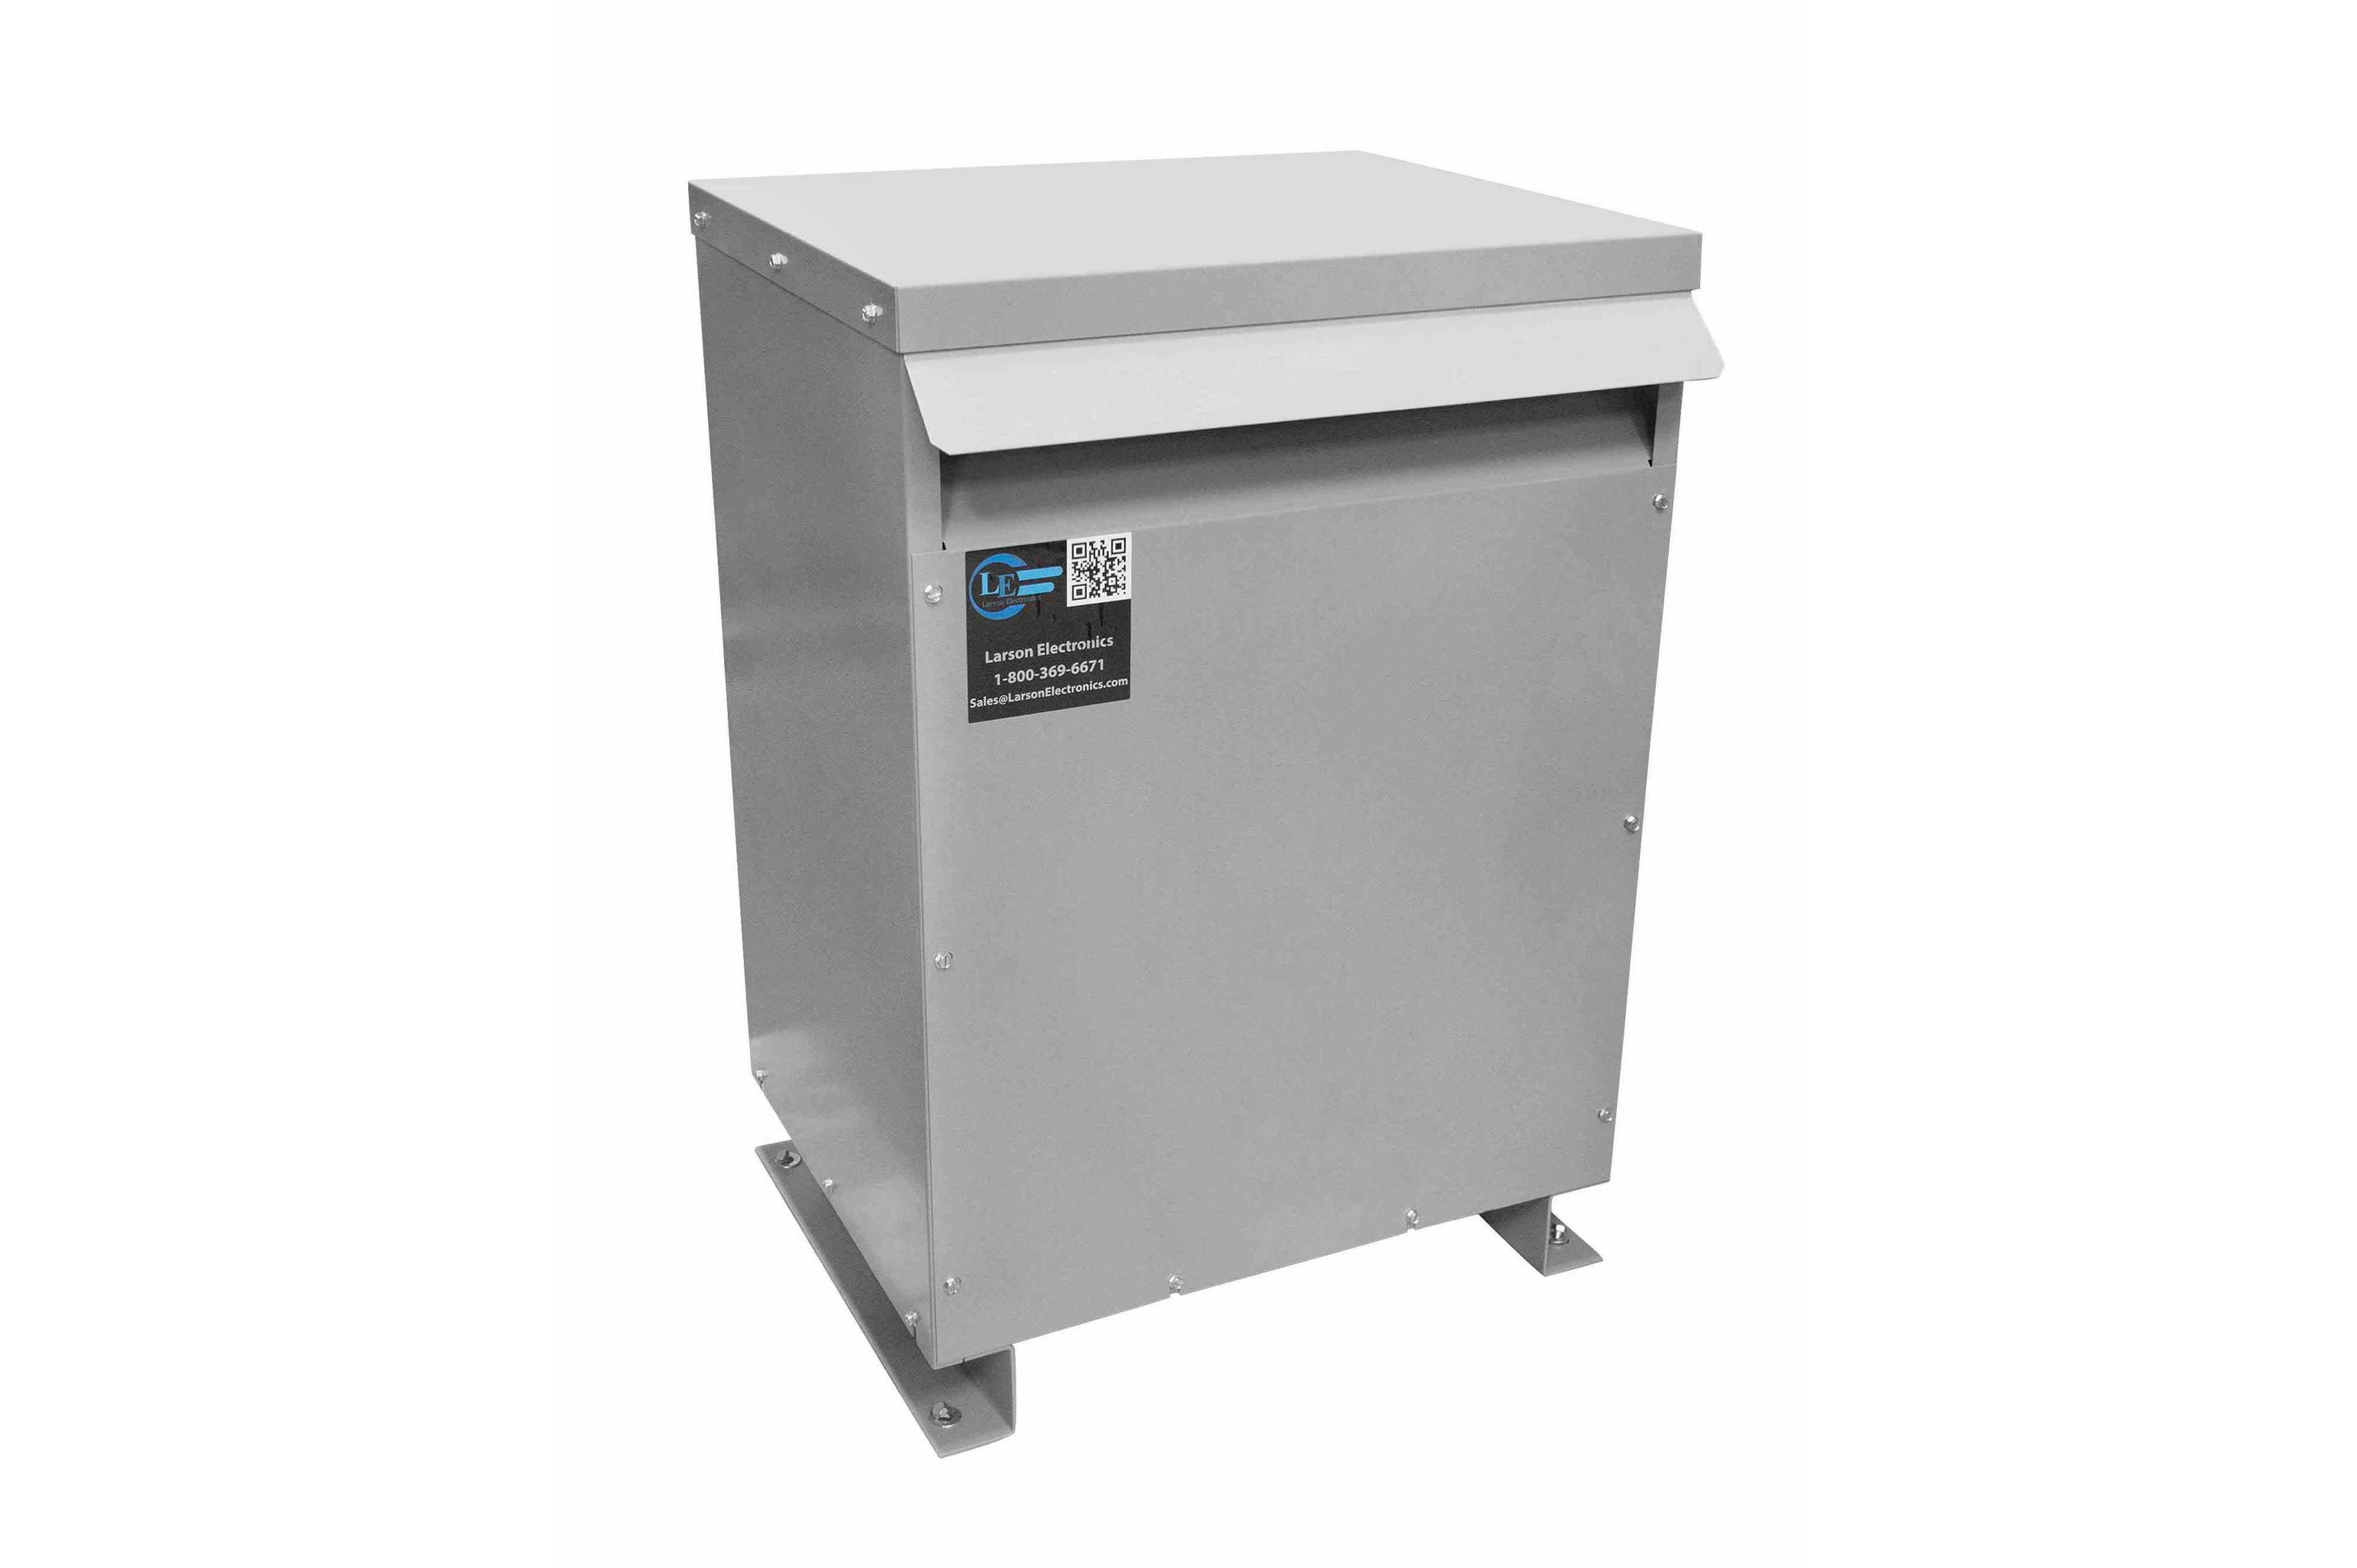 137.5 kVA 3PH Isolation Transformer, 460V Wye Primary, 208Y/120 Wye-N Secondary, N3R, Ventilated, 60 Hz